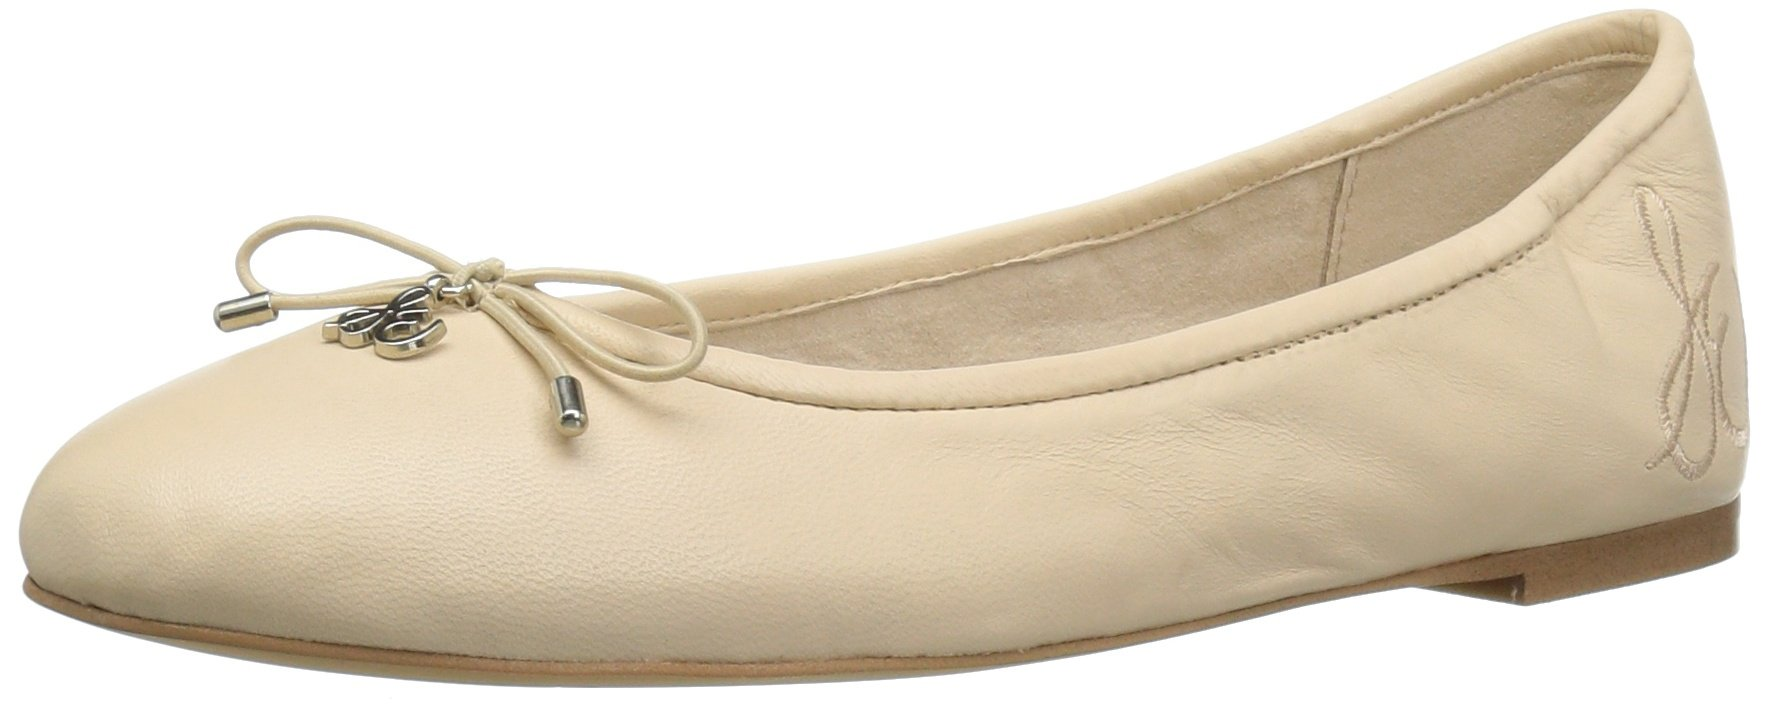 Sam Edelman Women's Felicia Ballet Flat, Summer Sand Leather, 6.5 M US